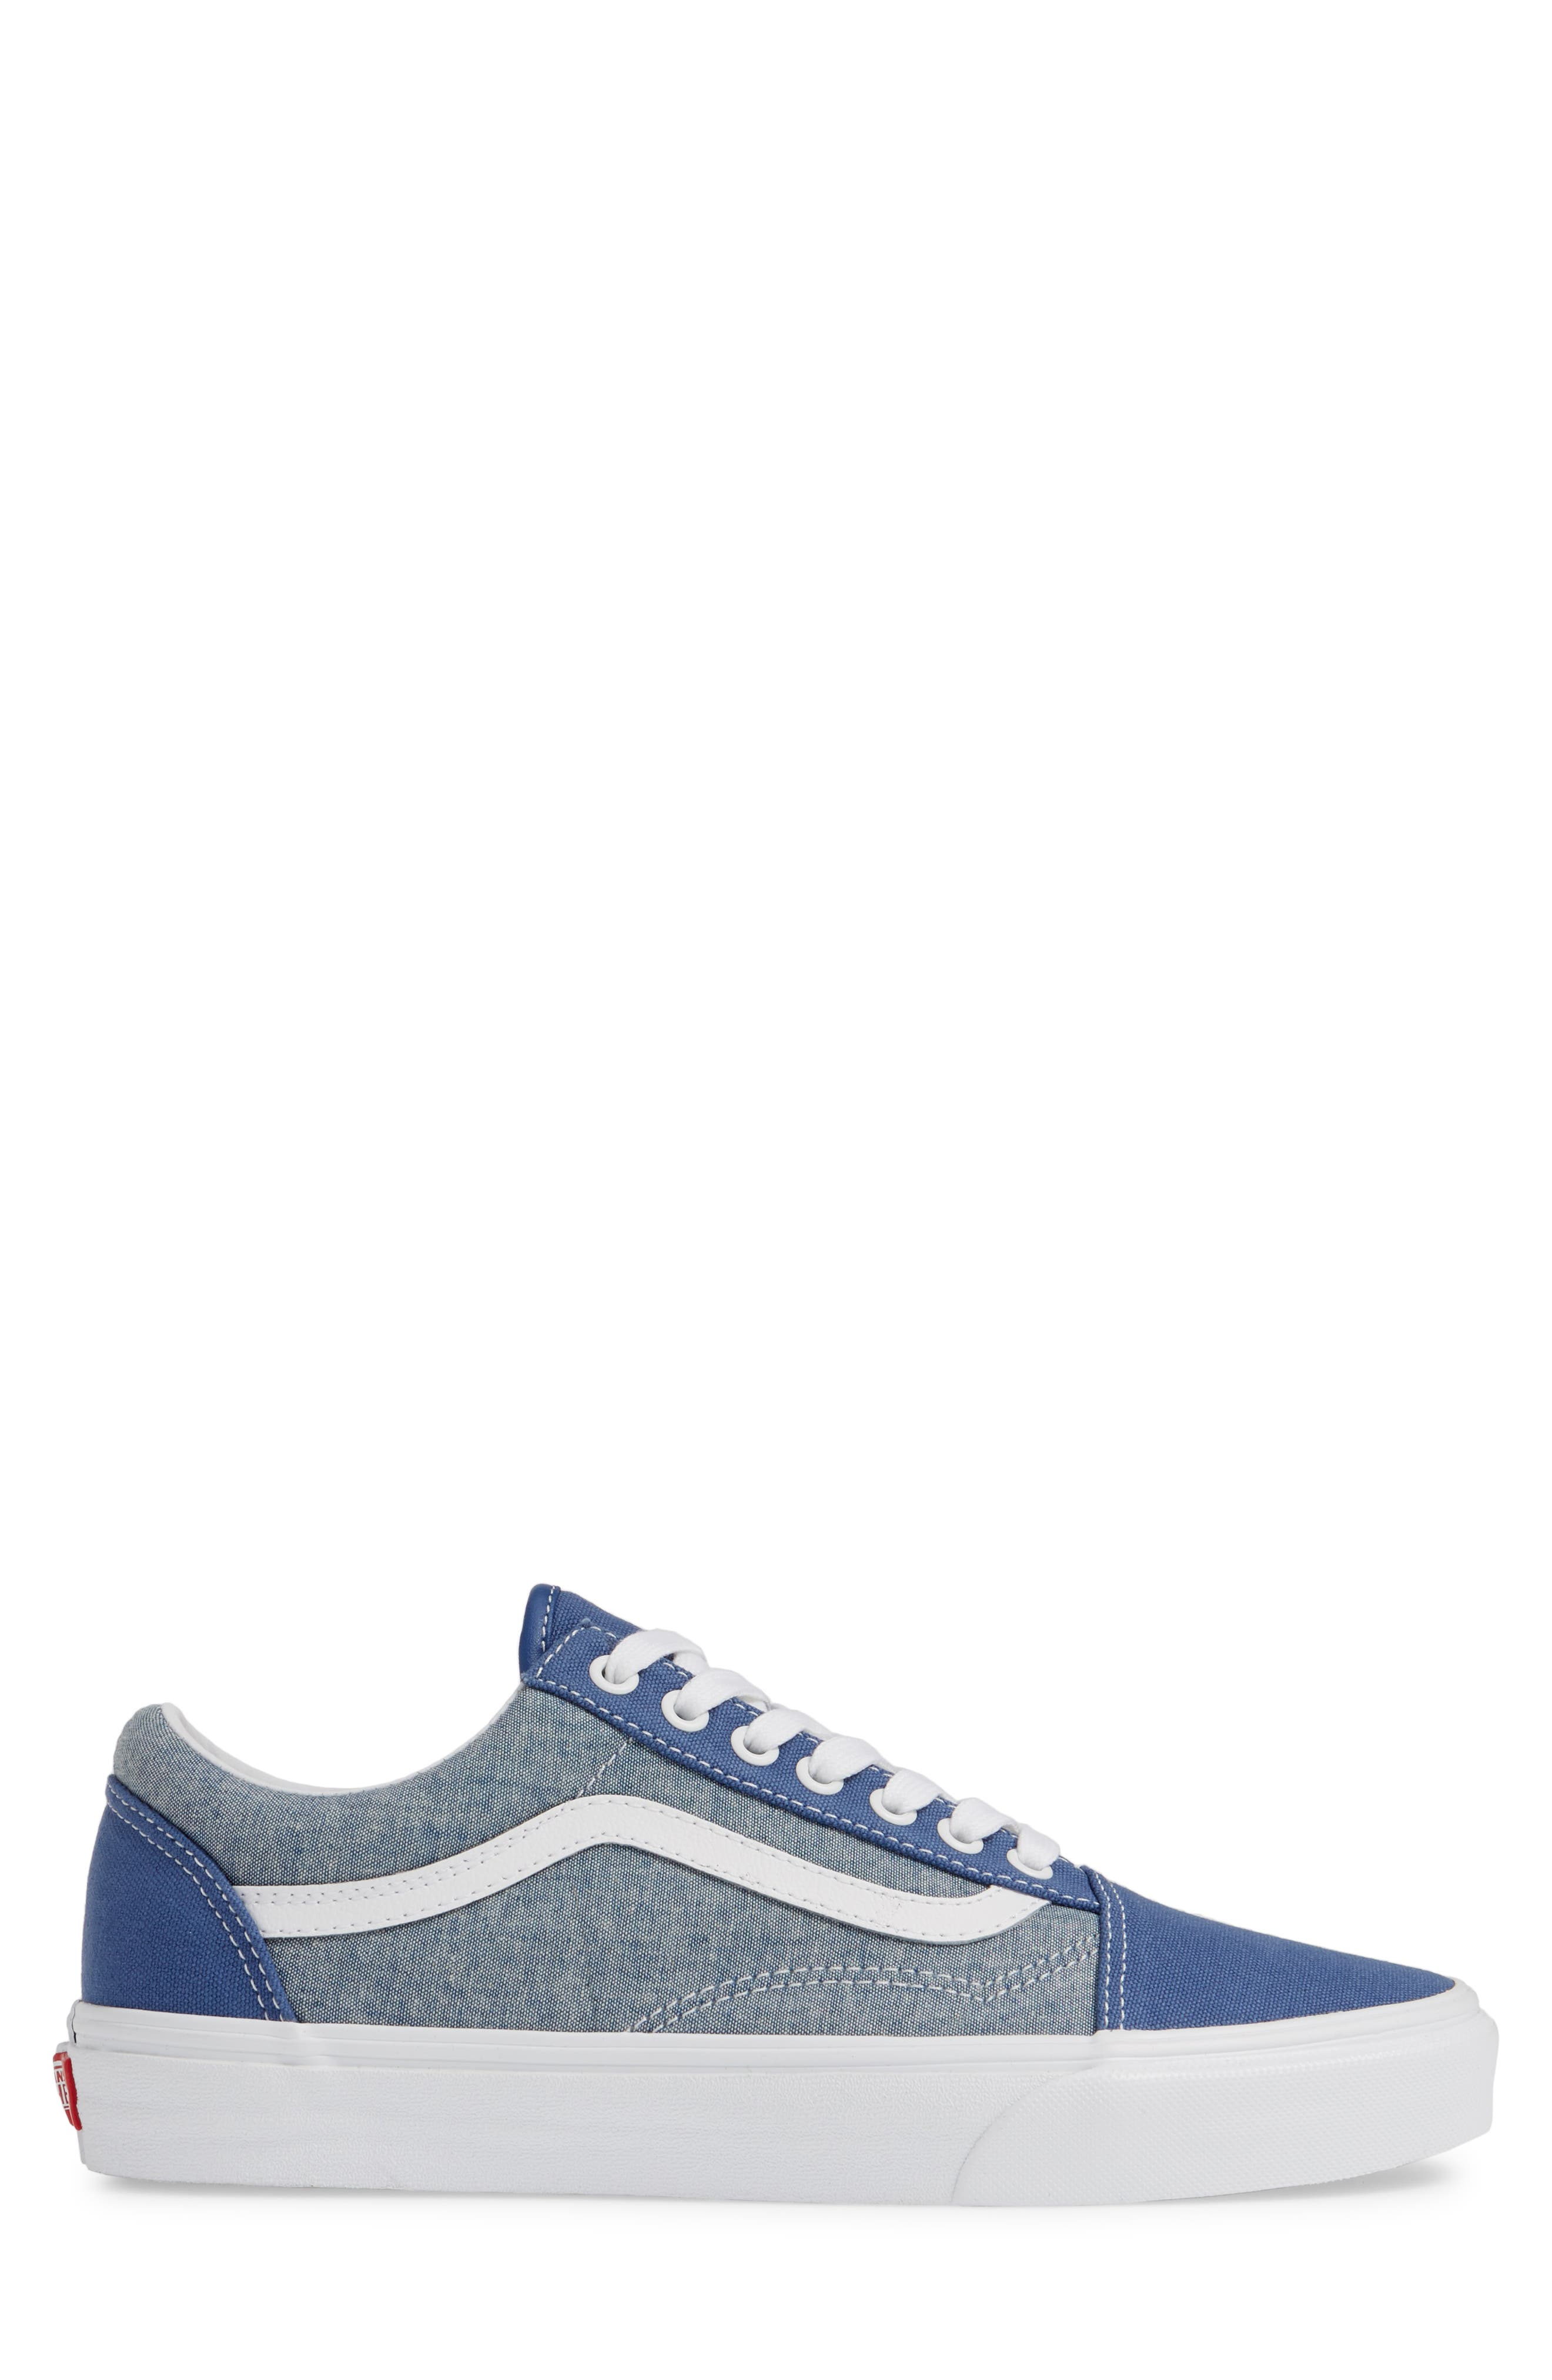 VANS, Old Skool Sneaker, Alternate thumbnail 3, color, CANVAS NAVY/ WHITE CHAMBRAY